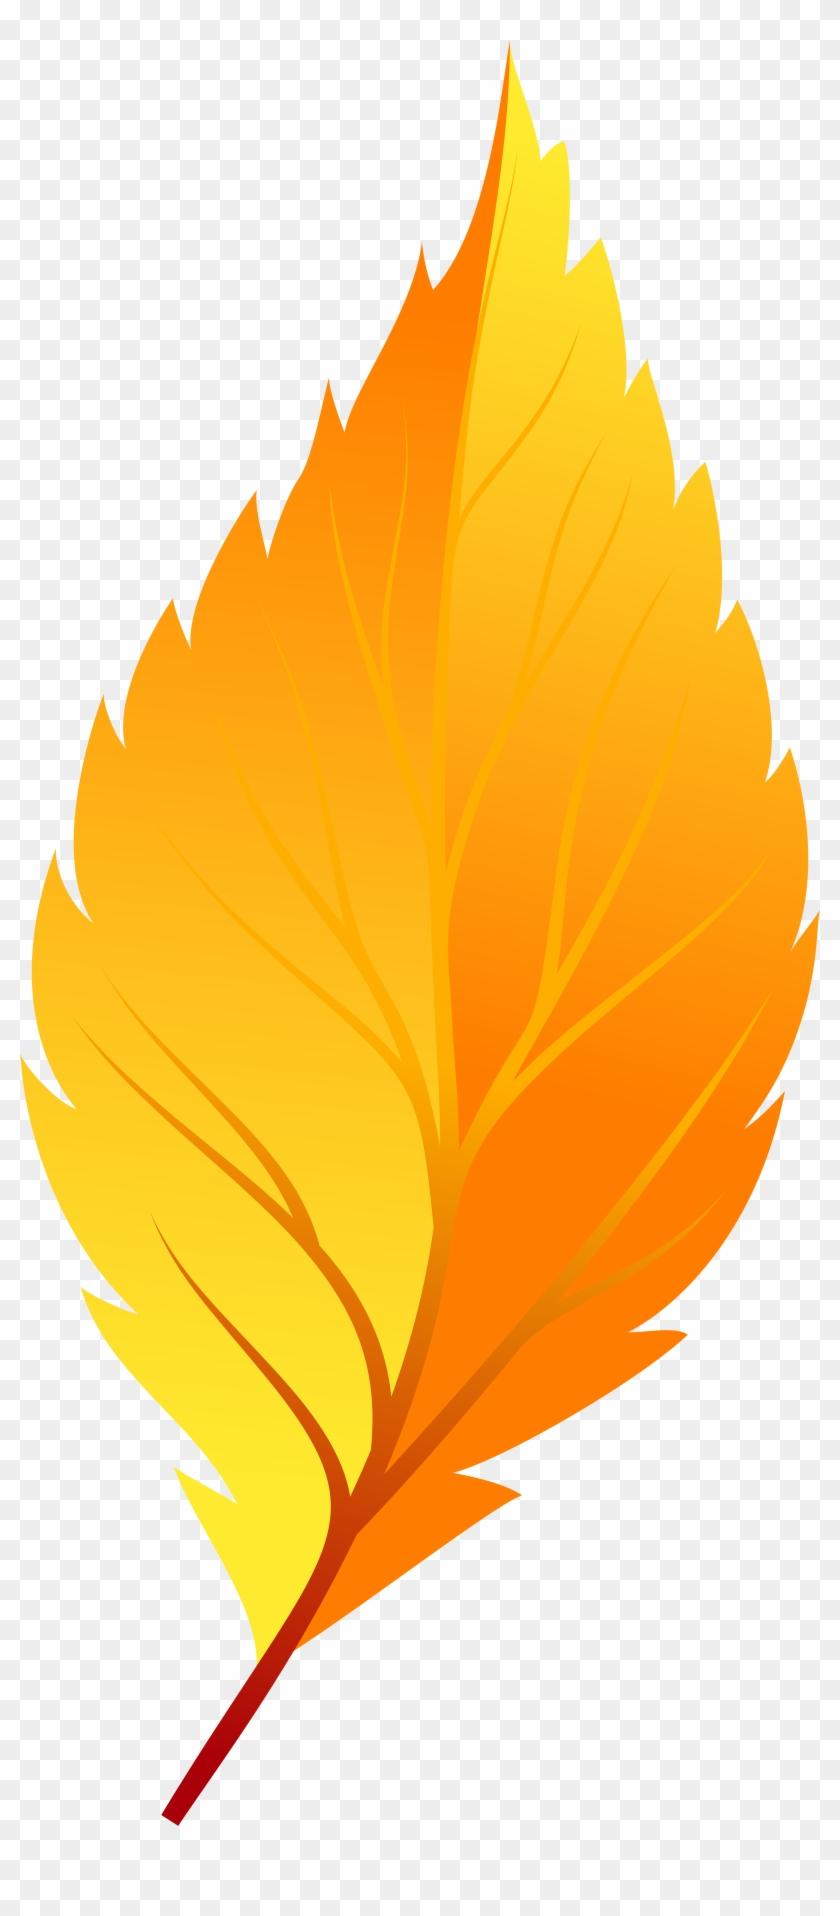 Yellow Autumn Leaf Png Clip Art - Clip Art #861